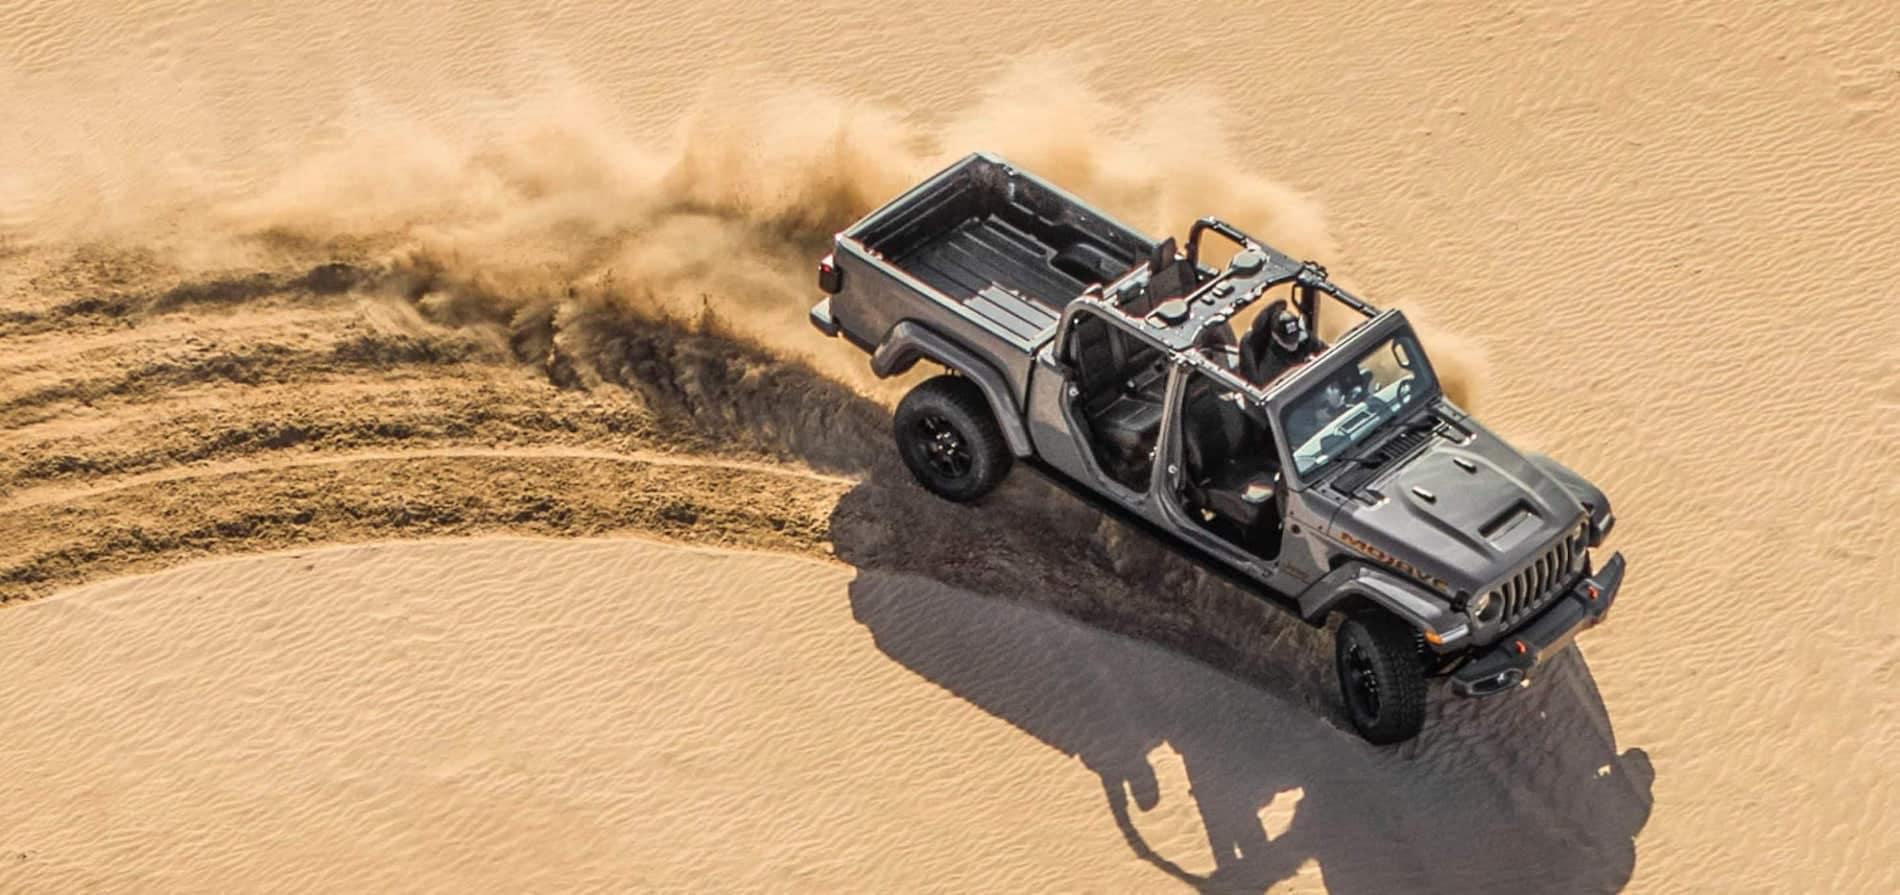 2021 Jeep Gladiator Engine Options Warrenton, VA